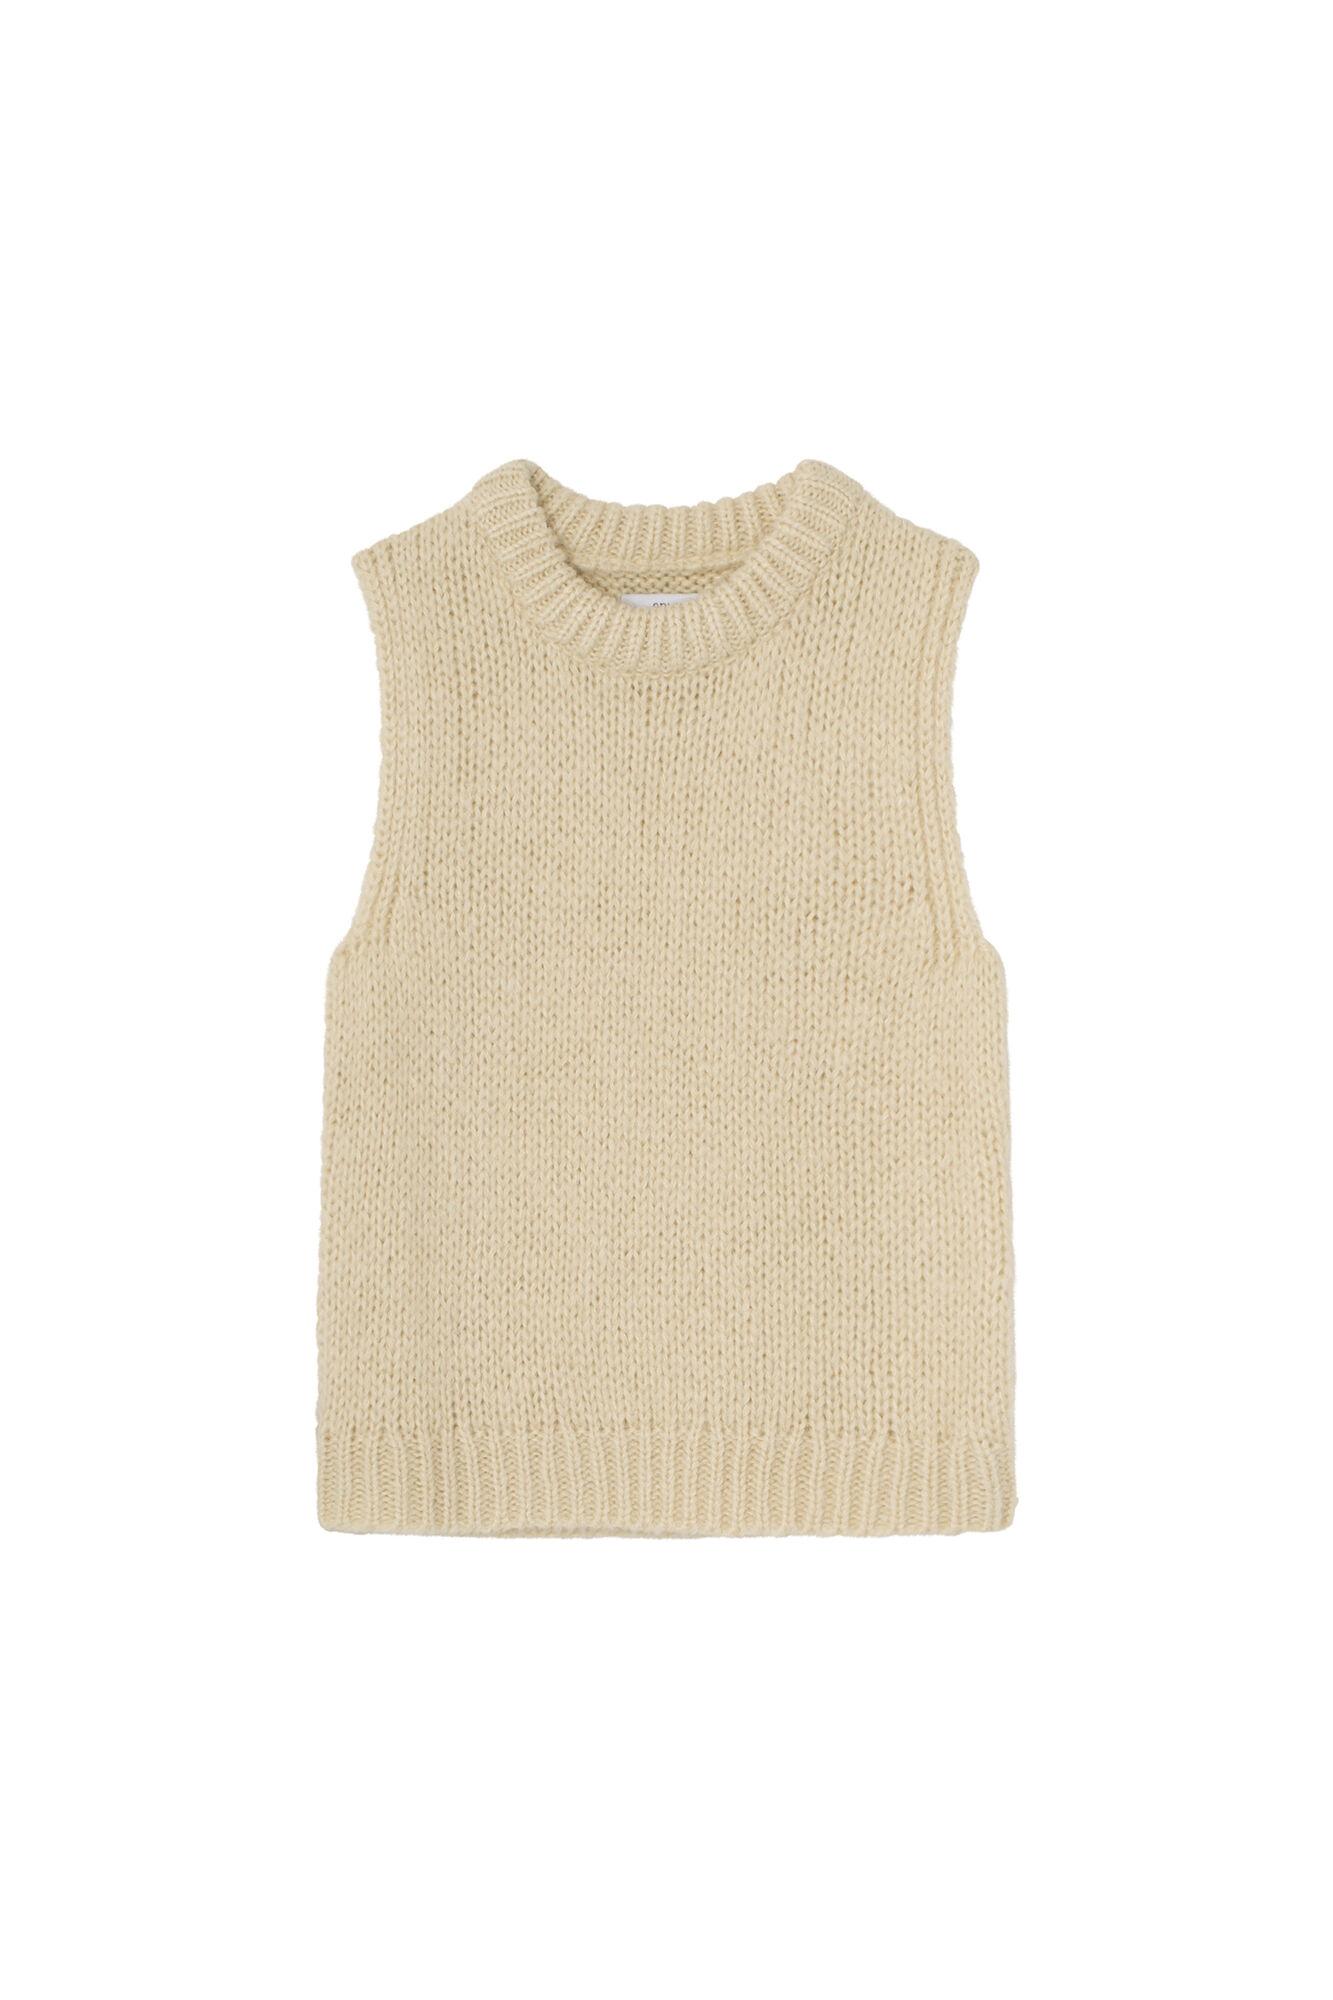 Envii Entrepka knit west, seedpearl mel, x-small